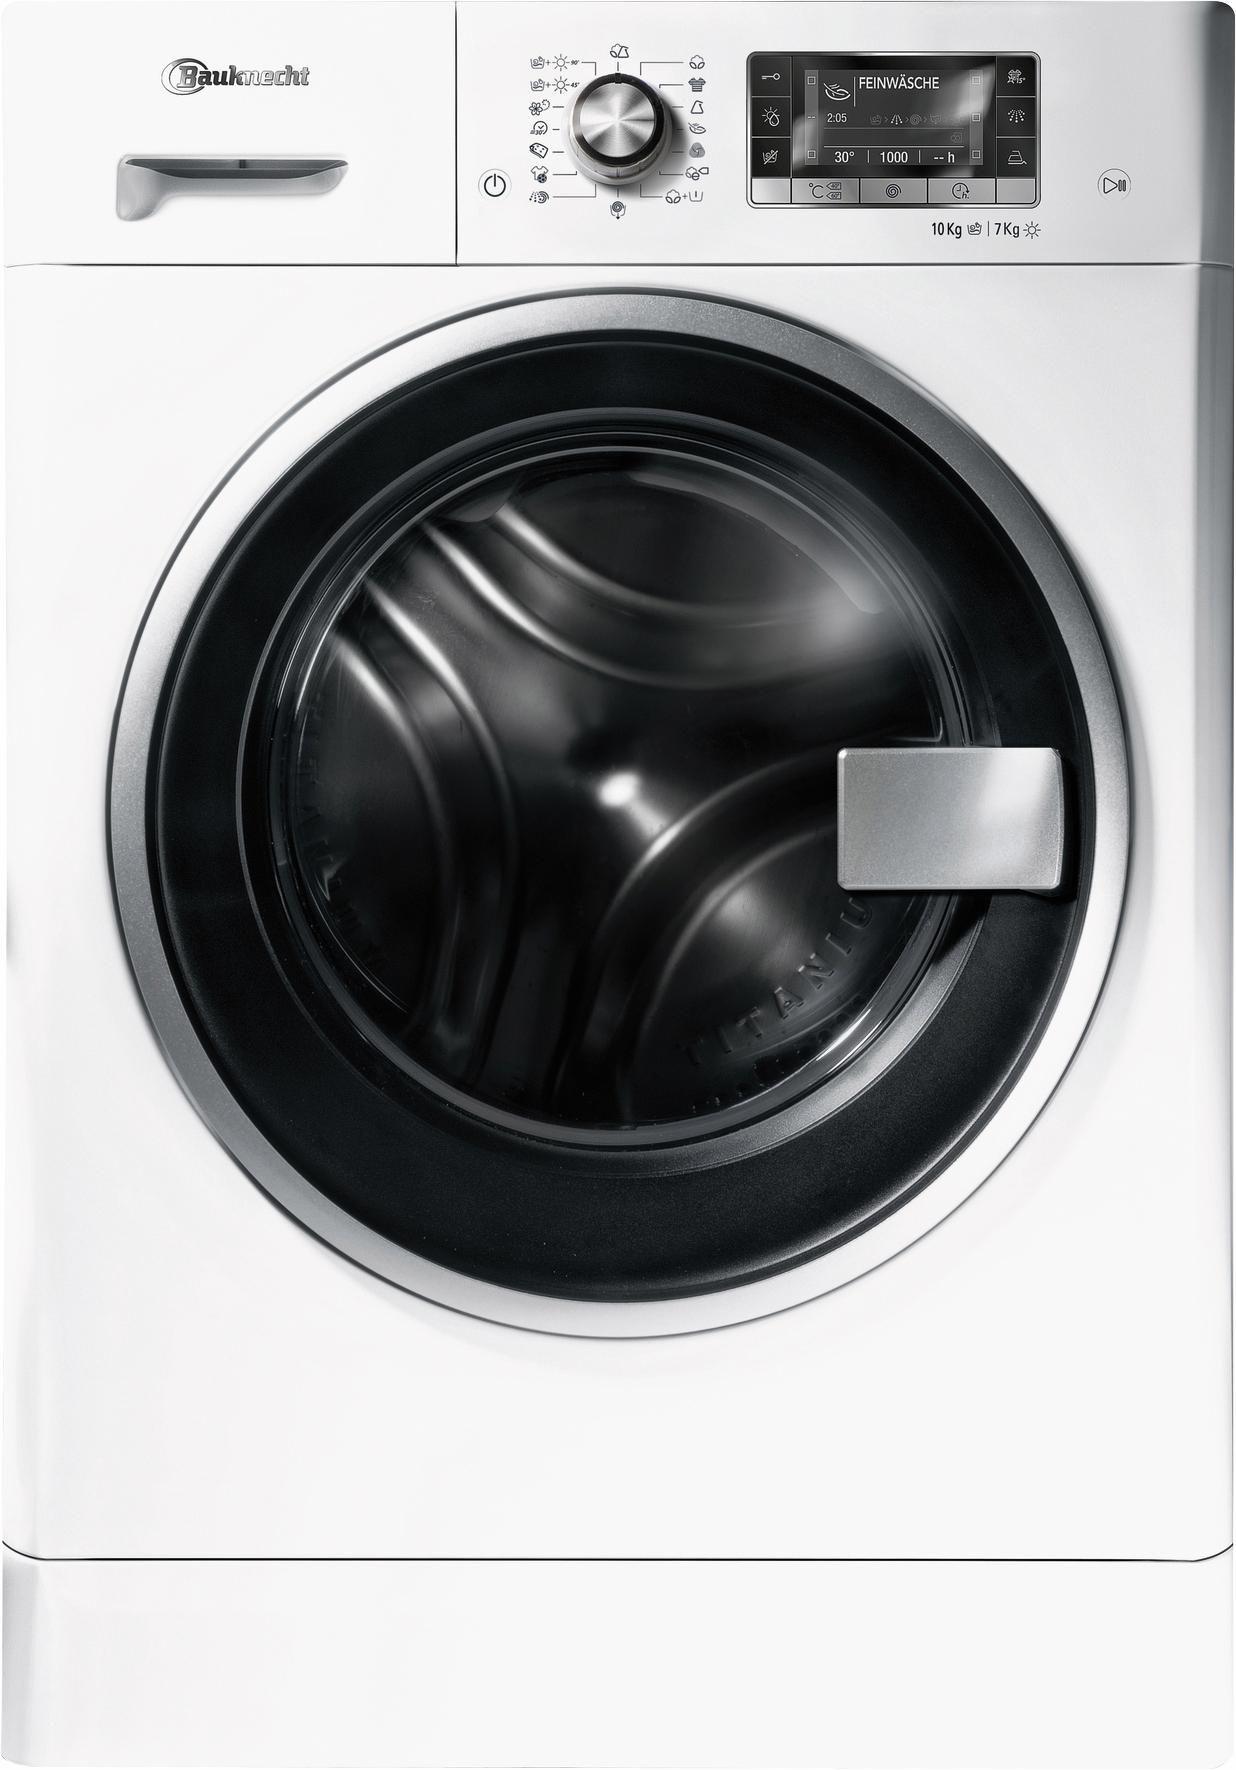 BAUKNECHT  Waschtrockner WATK PRIME 10716, A, 10 kg / 7 kg, 1.600 U/Min